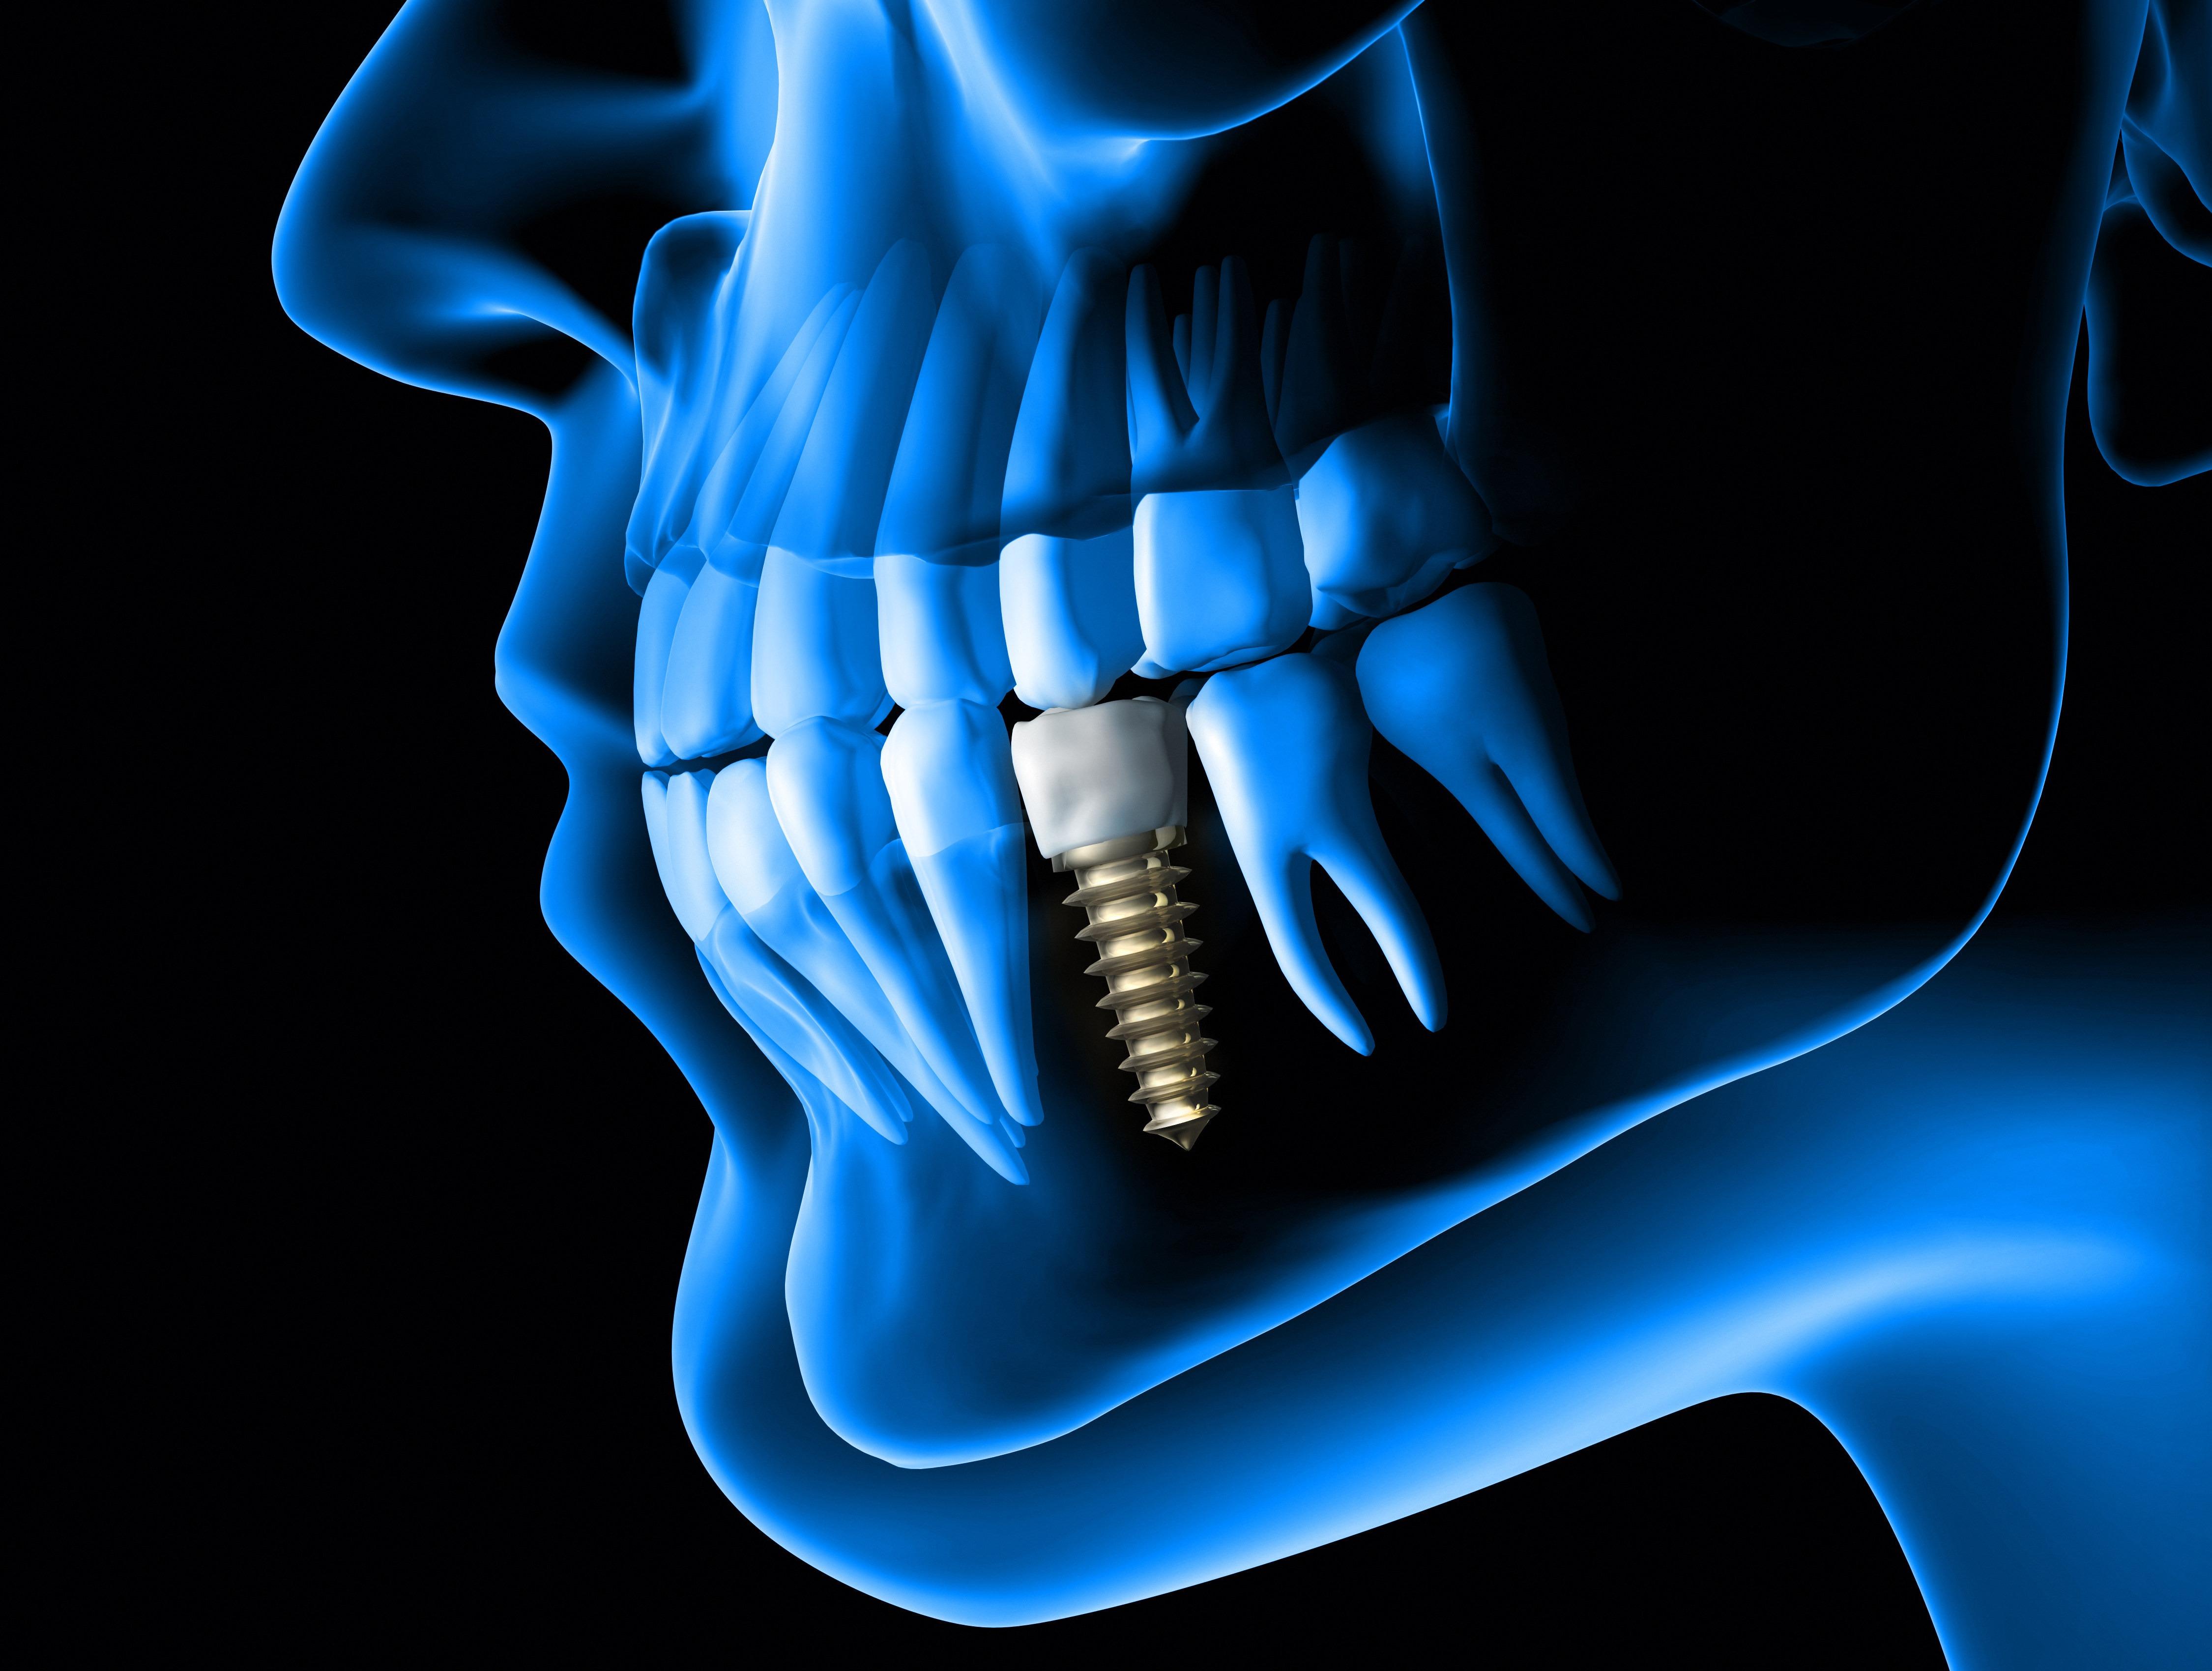 Implant Teeth Blue Scan